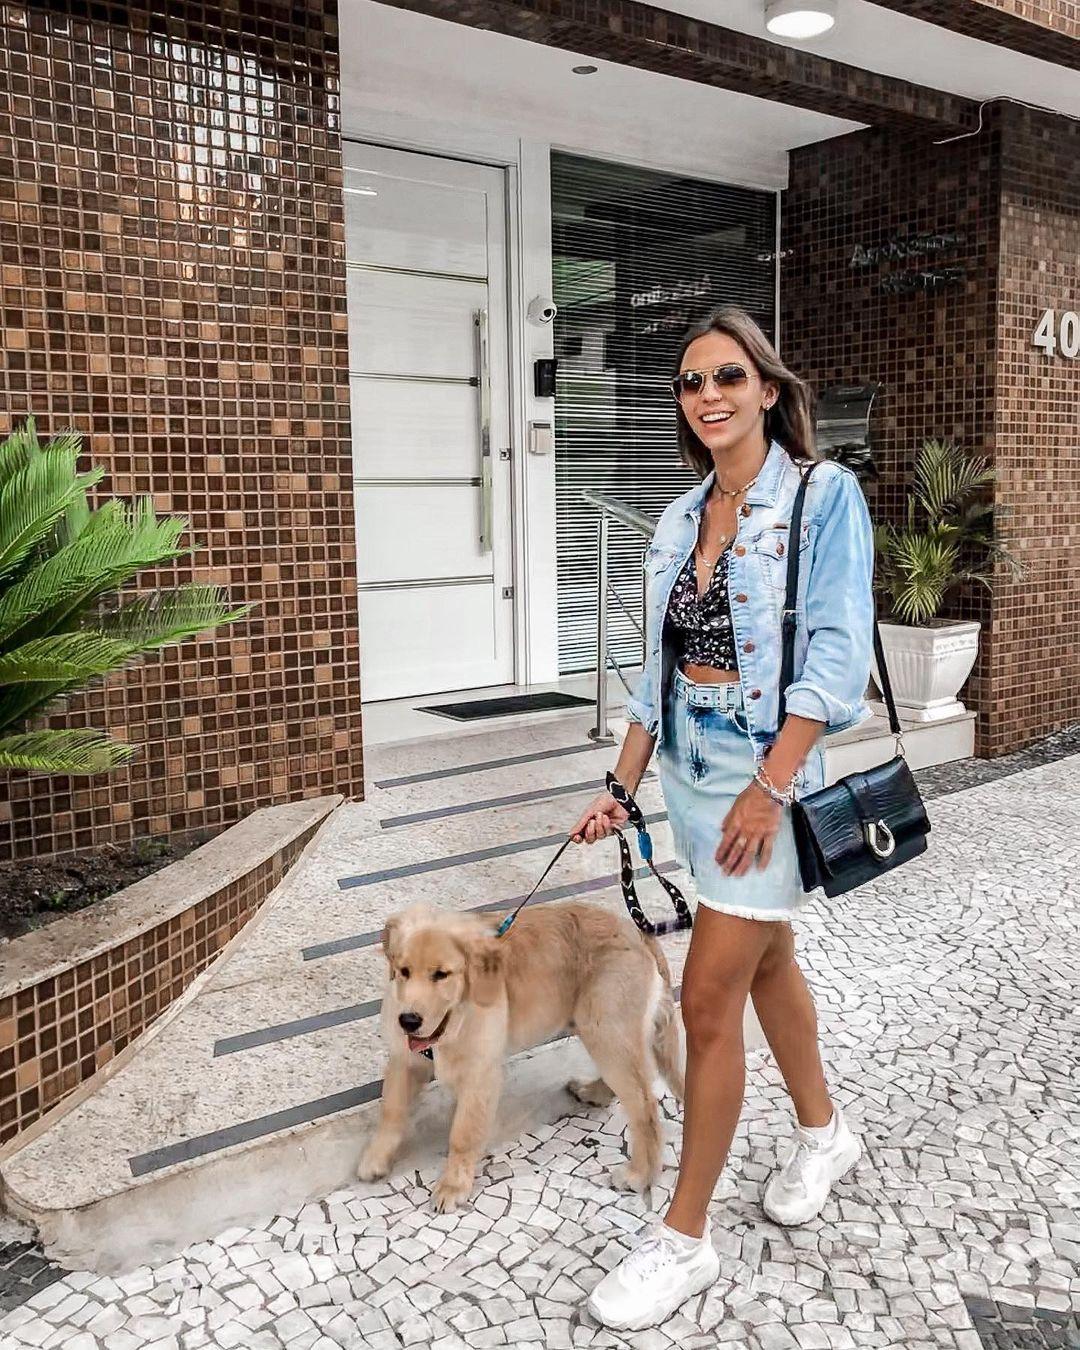 ana flavia giacomini, miss ilha dos lobos mundo 2019. - Página 3 Fvkwx410